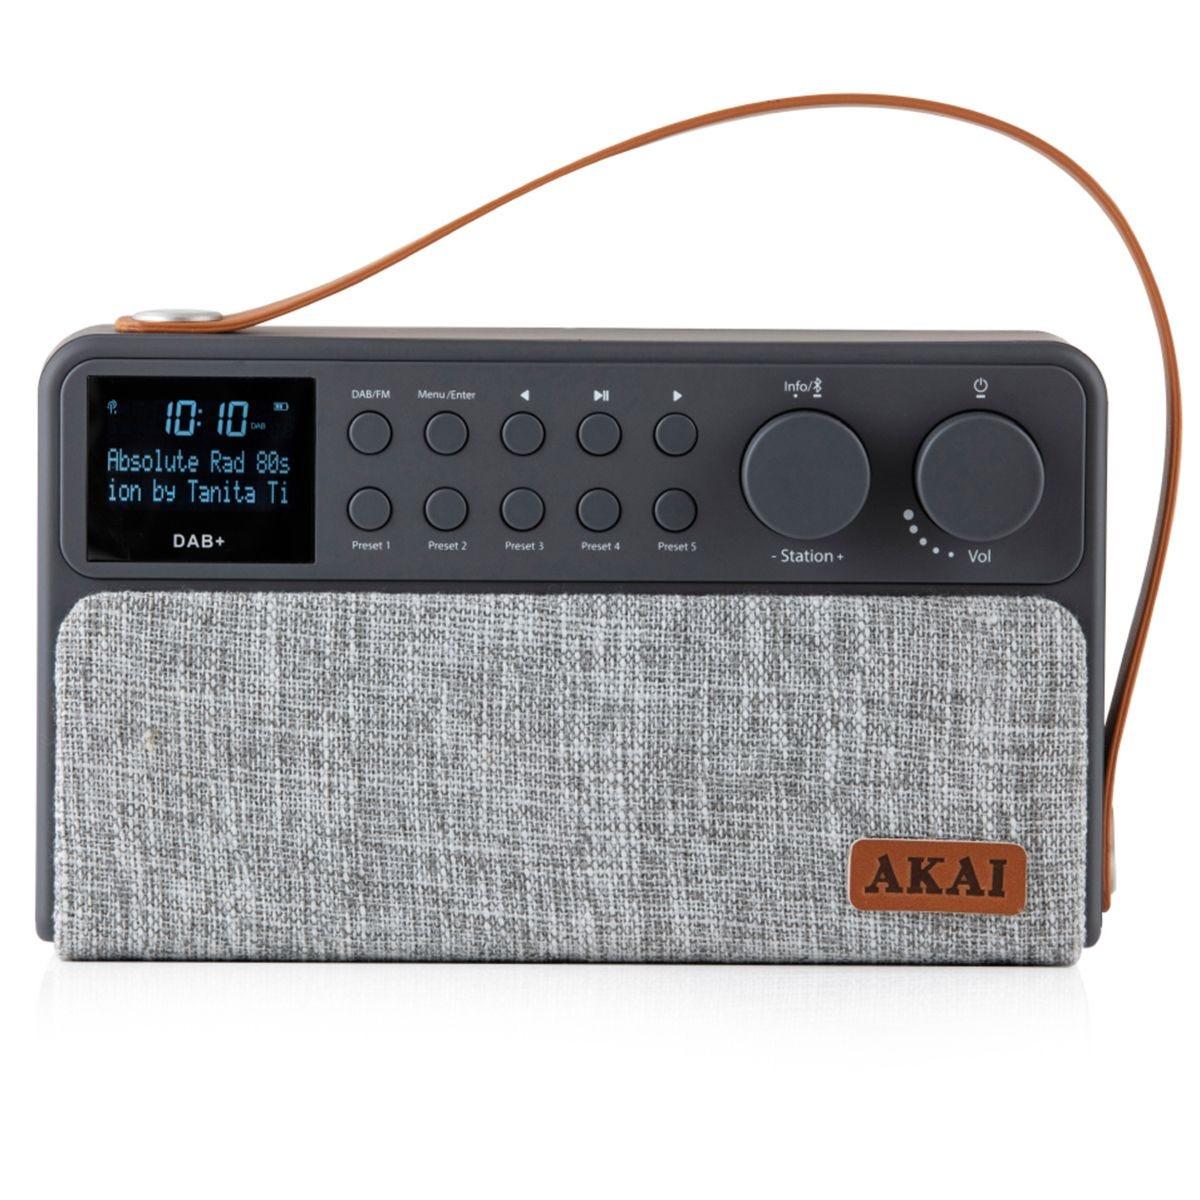 AKAI Rechargeable DAB+ Radio - Grey